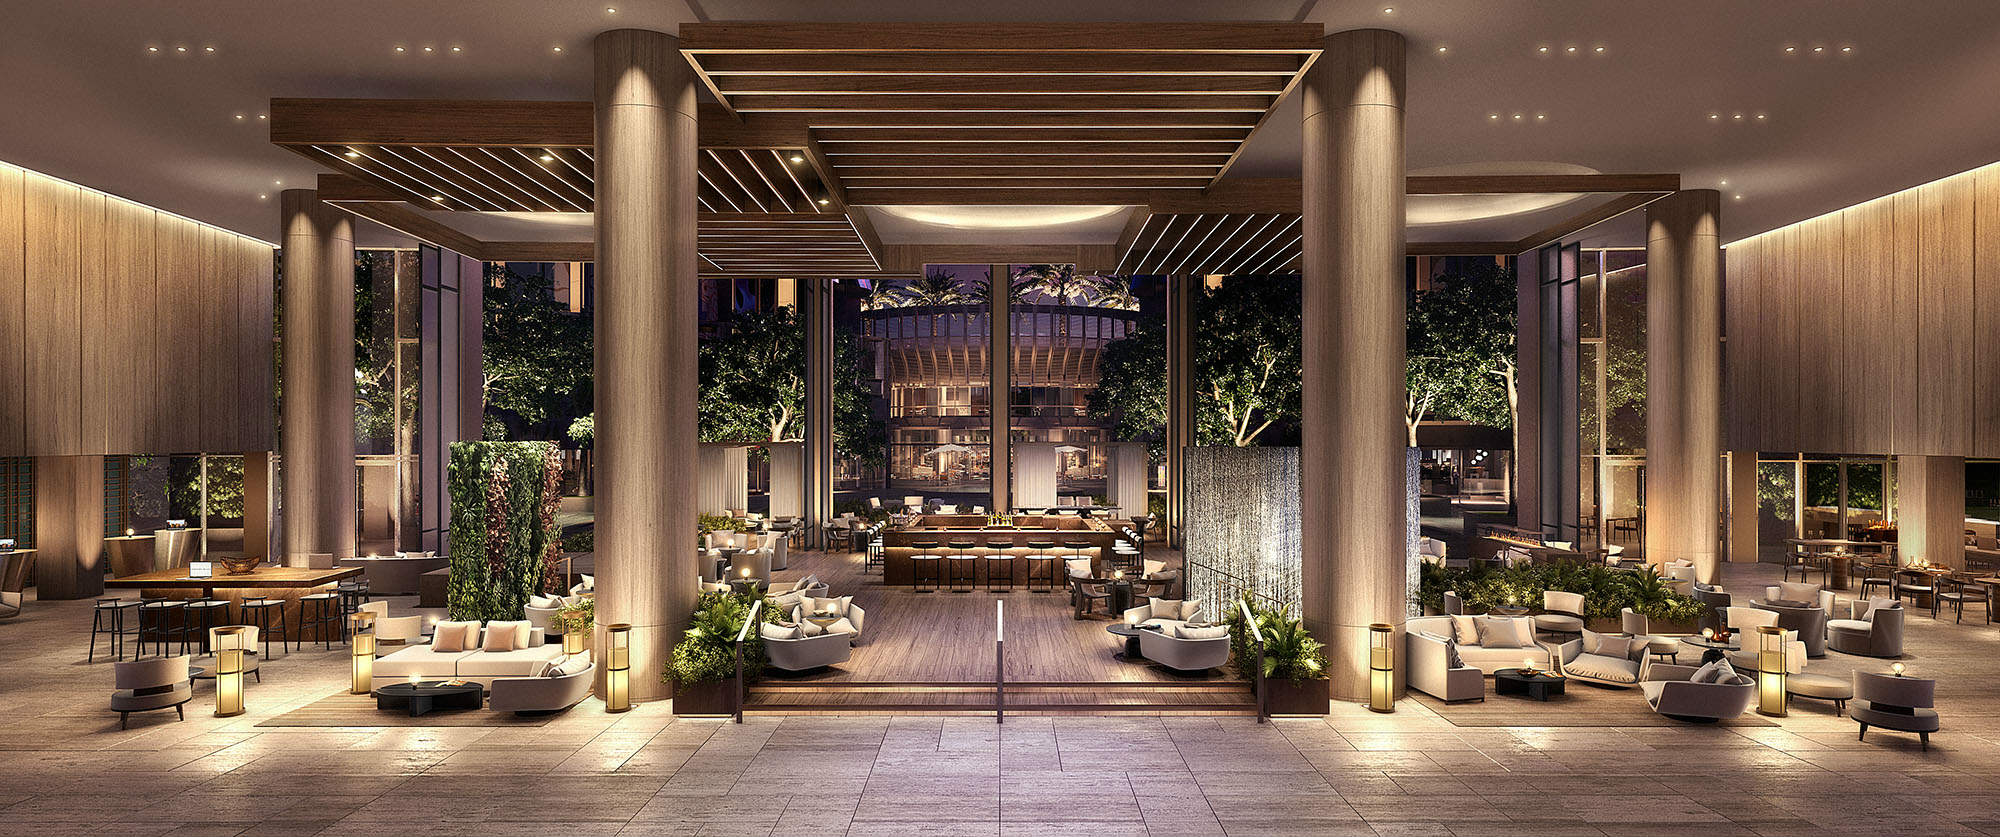 The Century Plaza Hotel